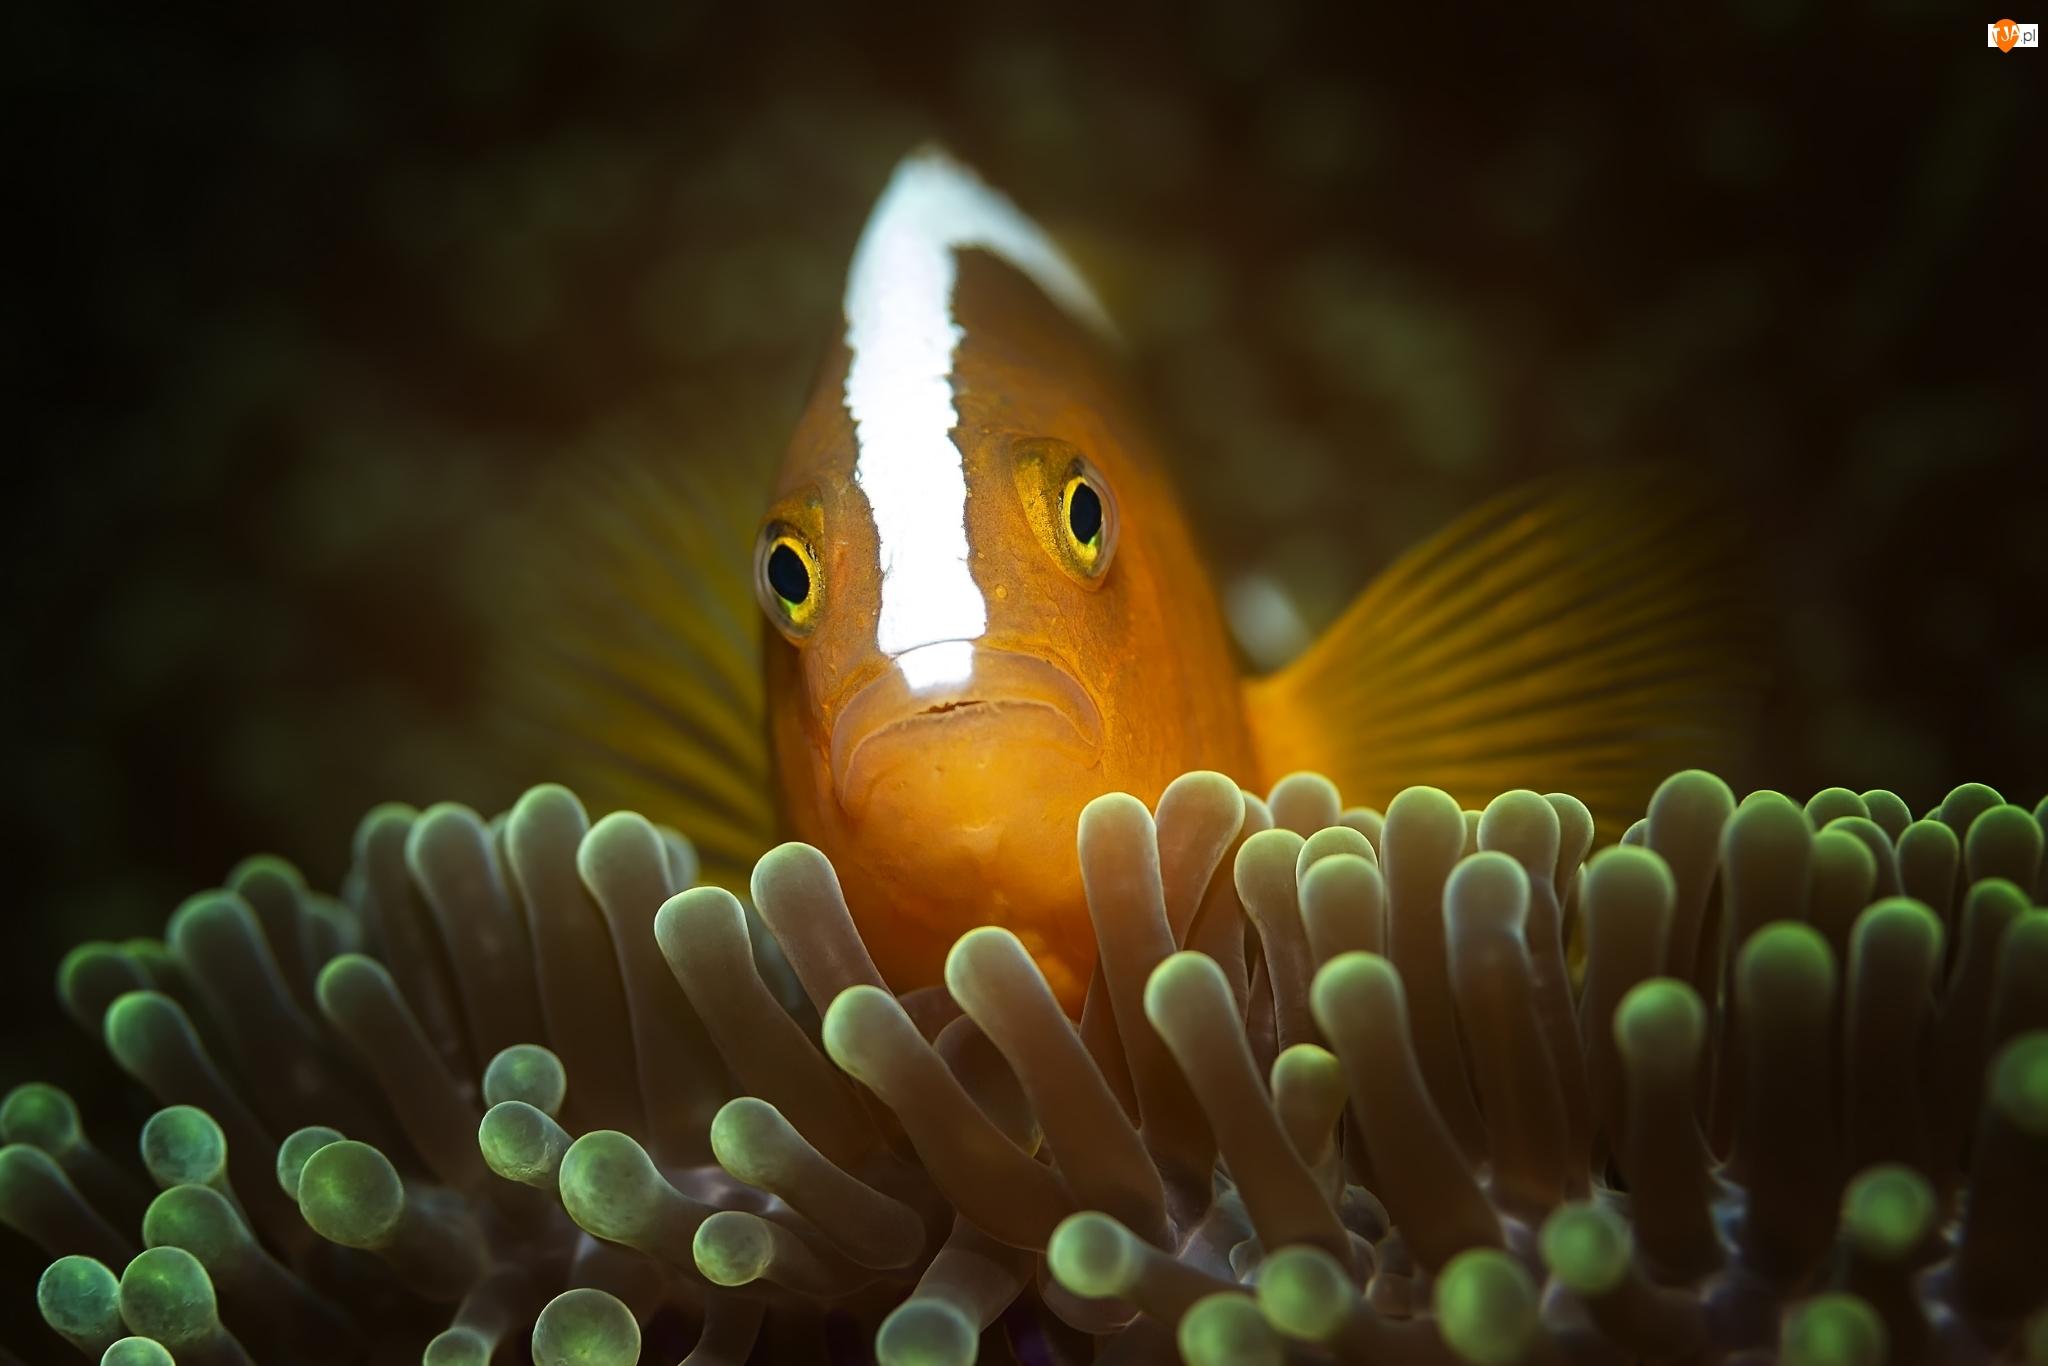 Orange skunk clownfish, Rybka, Błazenek